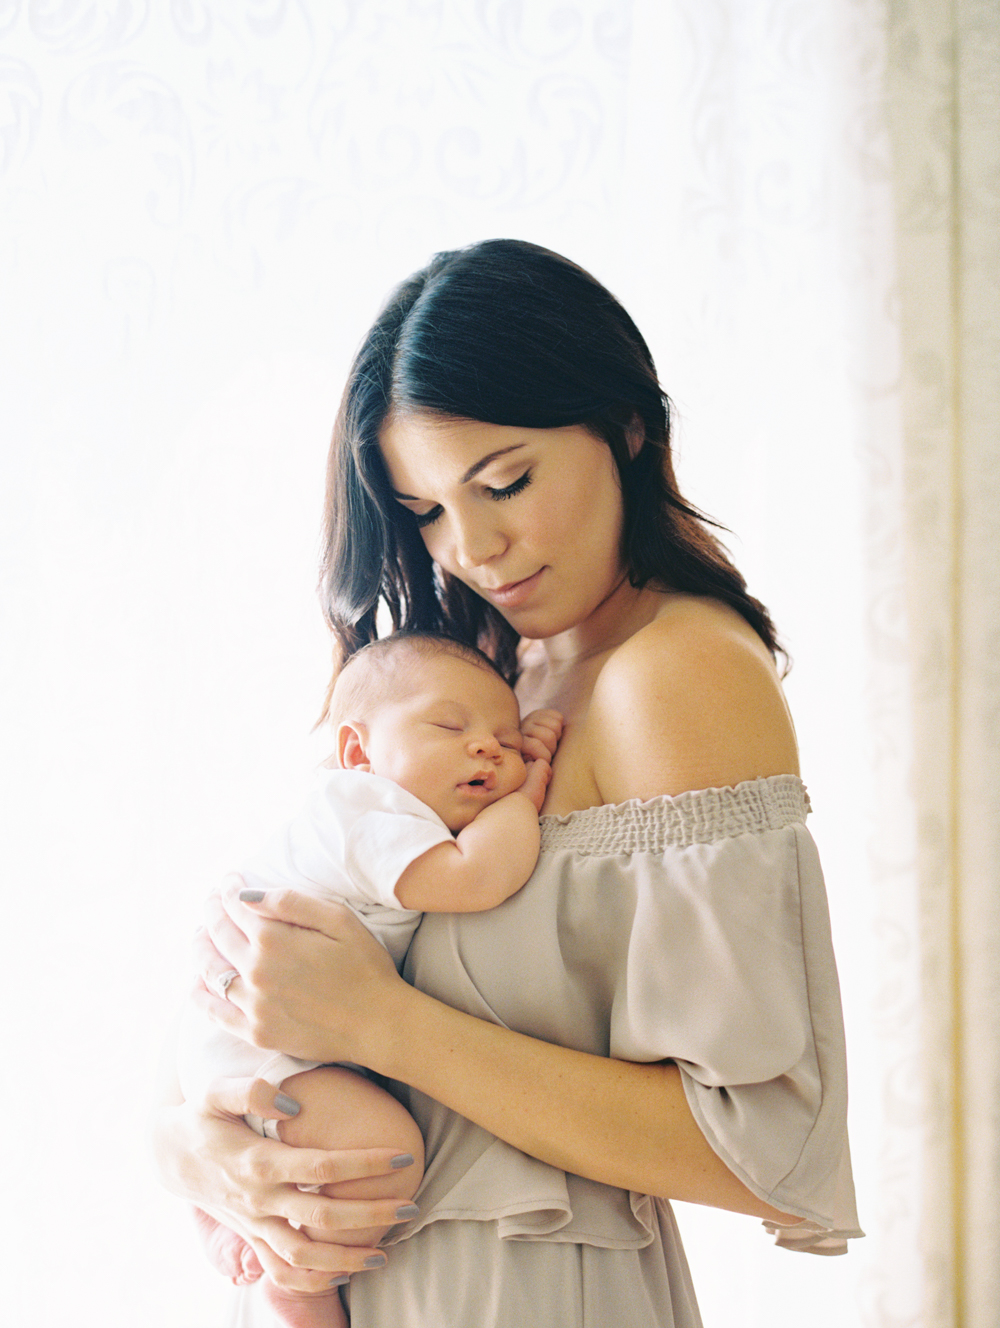 south-bay-newborn-photographer-1015.jpg